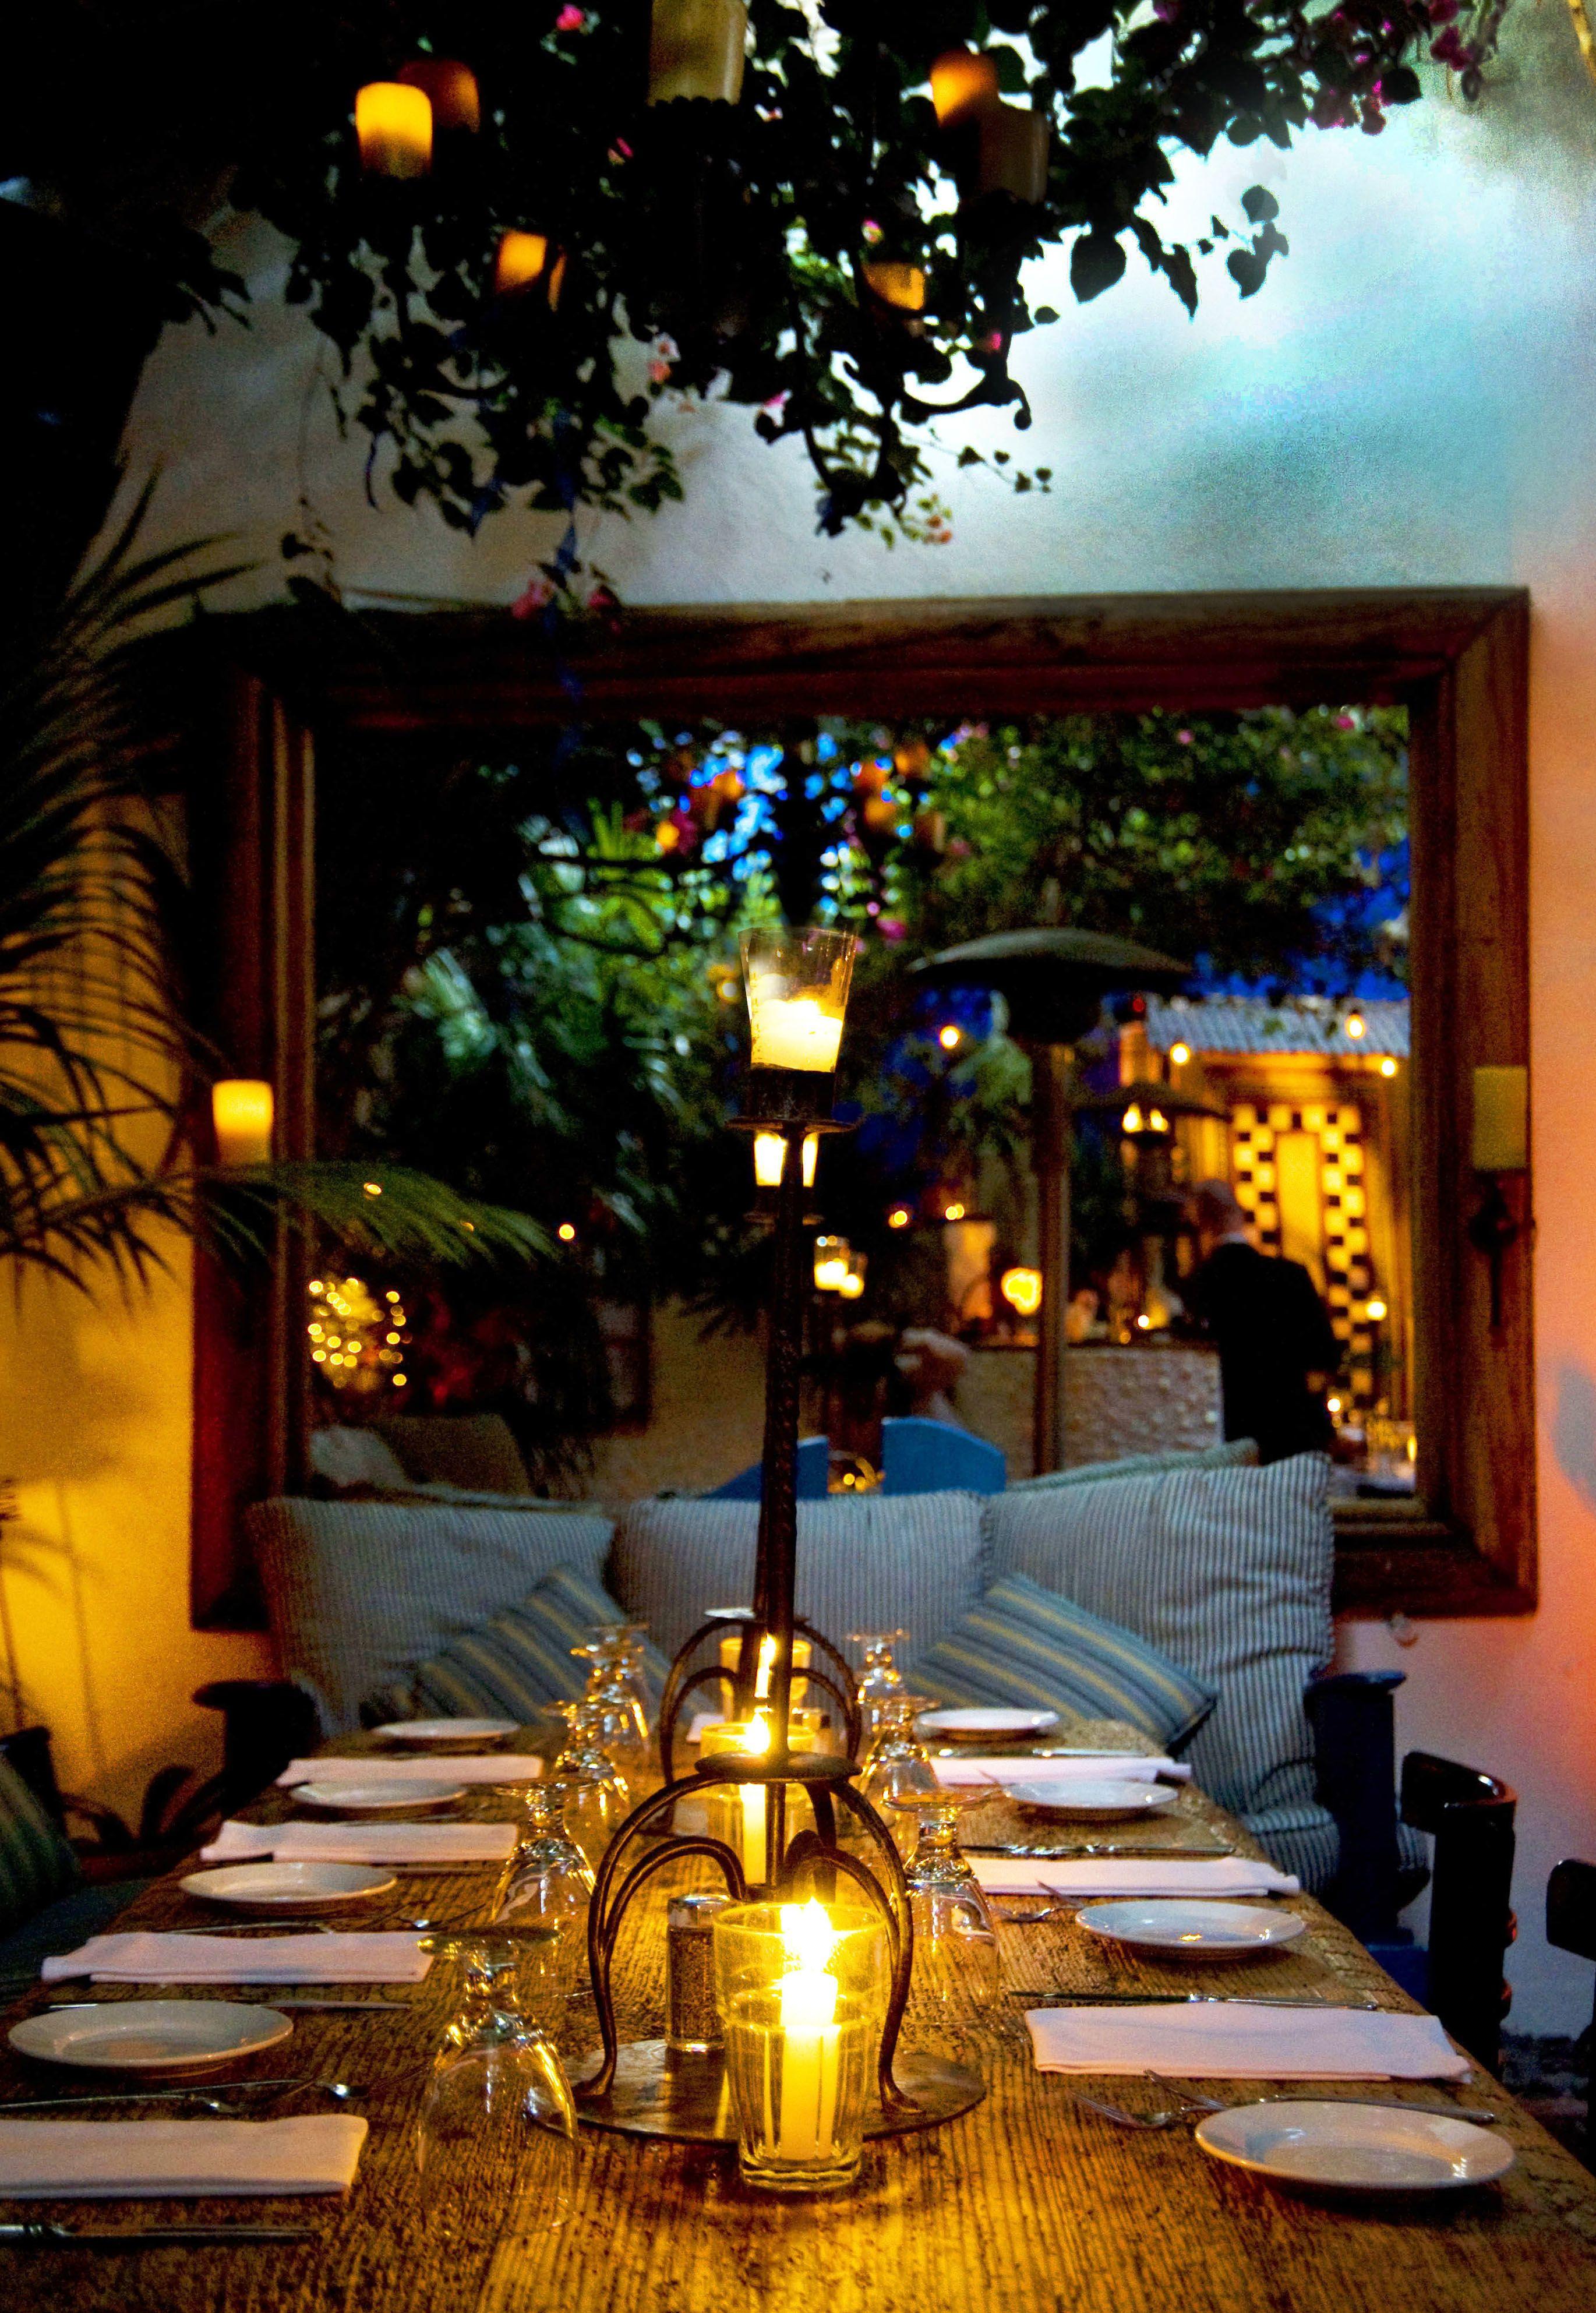 The Most Romantic Restaurants In The World Suvemajake Pinterest